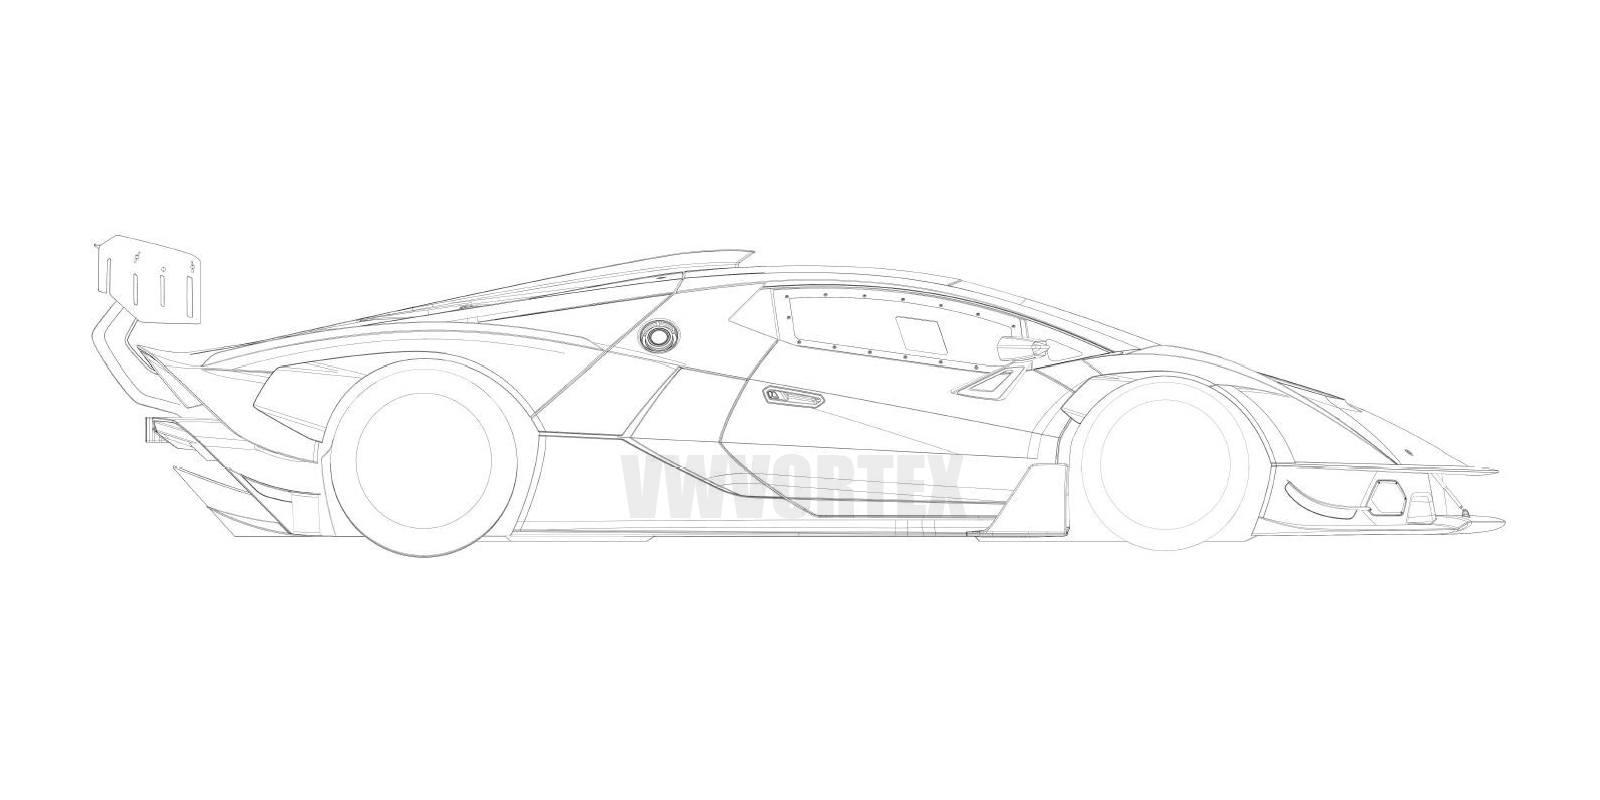 Oettinger Announces Package for B8.5 Audi A4 Sedan and Avant - Fourtitude.com